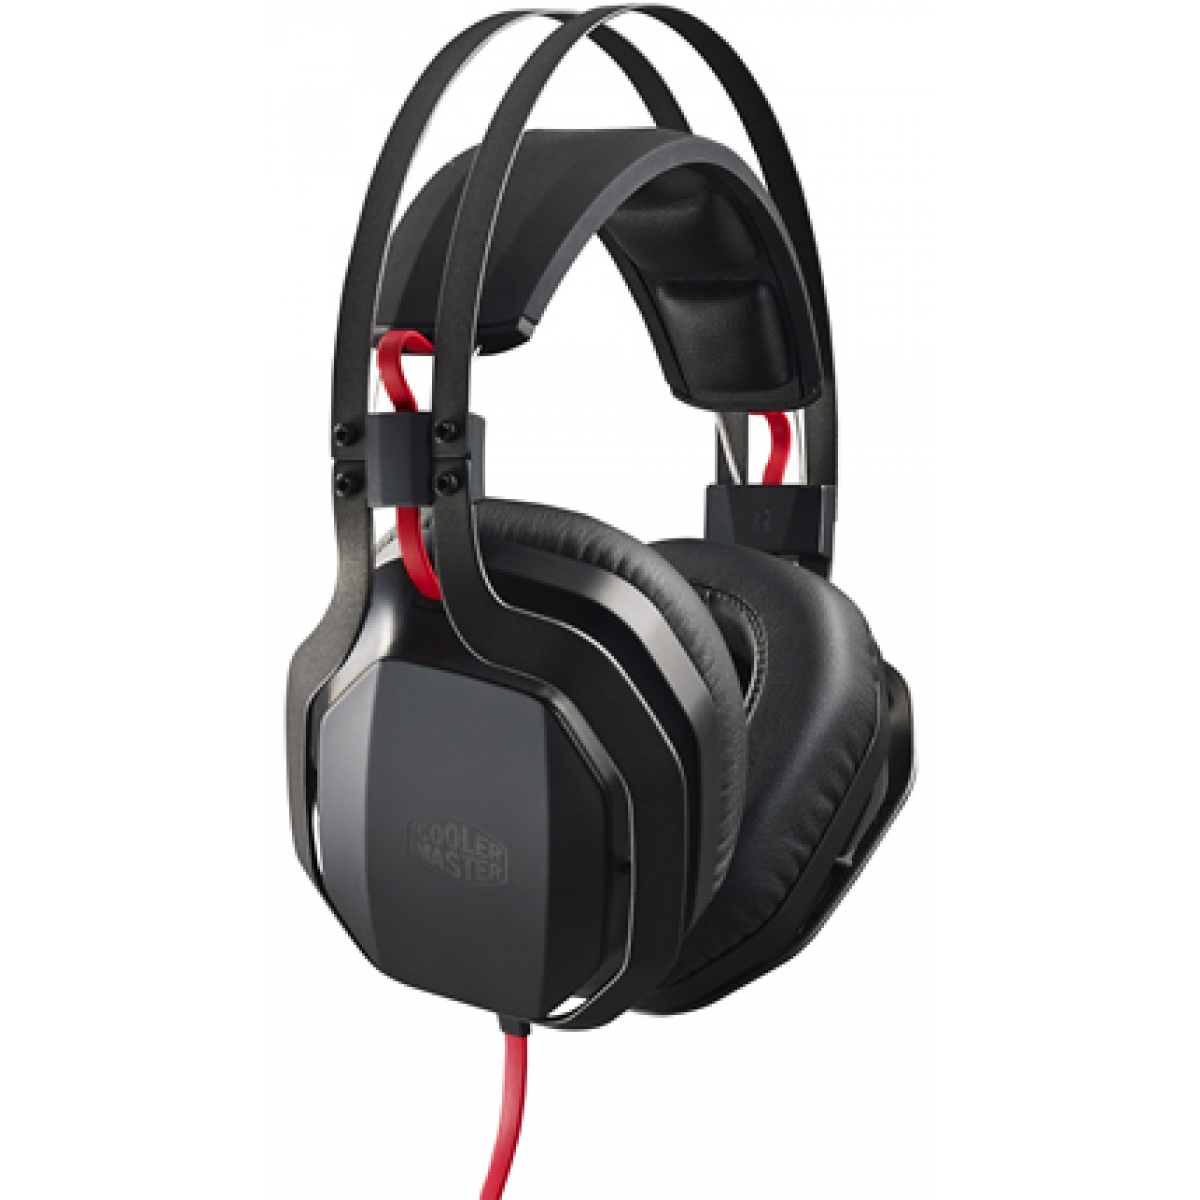 Headset Gamer Cooler Master Masterpulse Pro RGB 7.1 SGH-8700-KK7D1 USB C/ Microfone